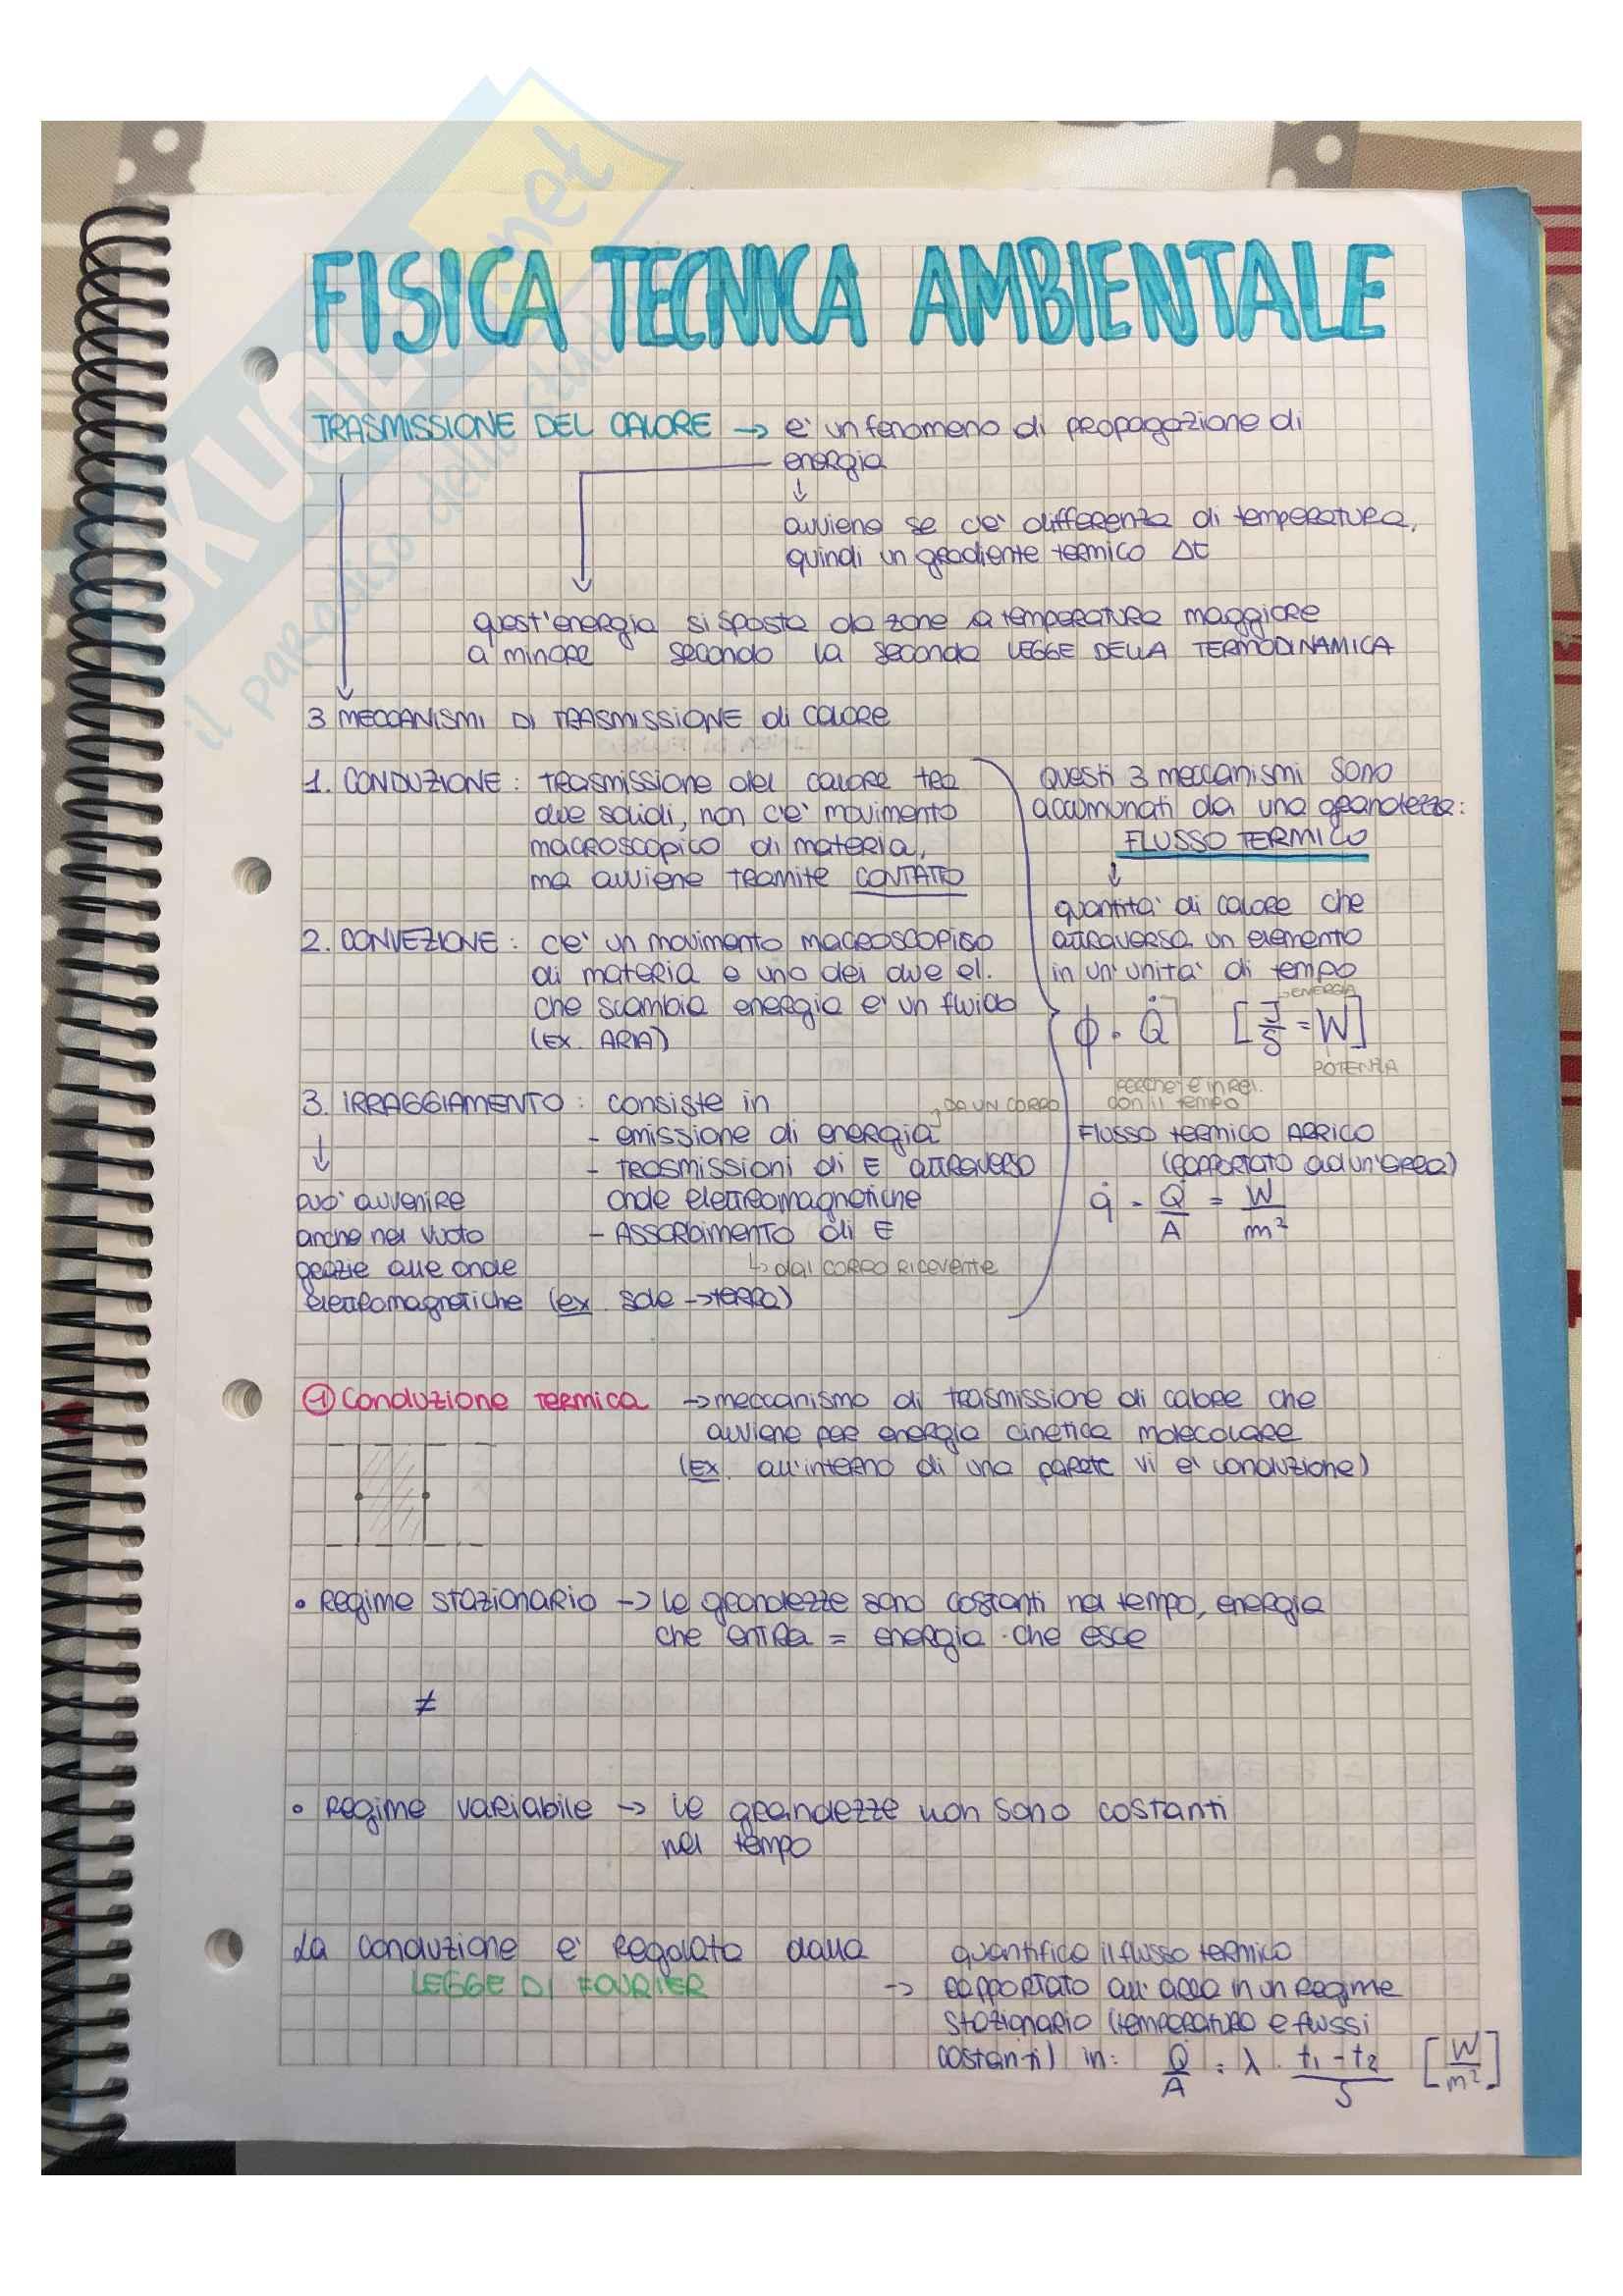 Fisica tecnica ambientale pt1